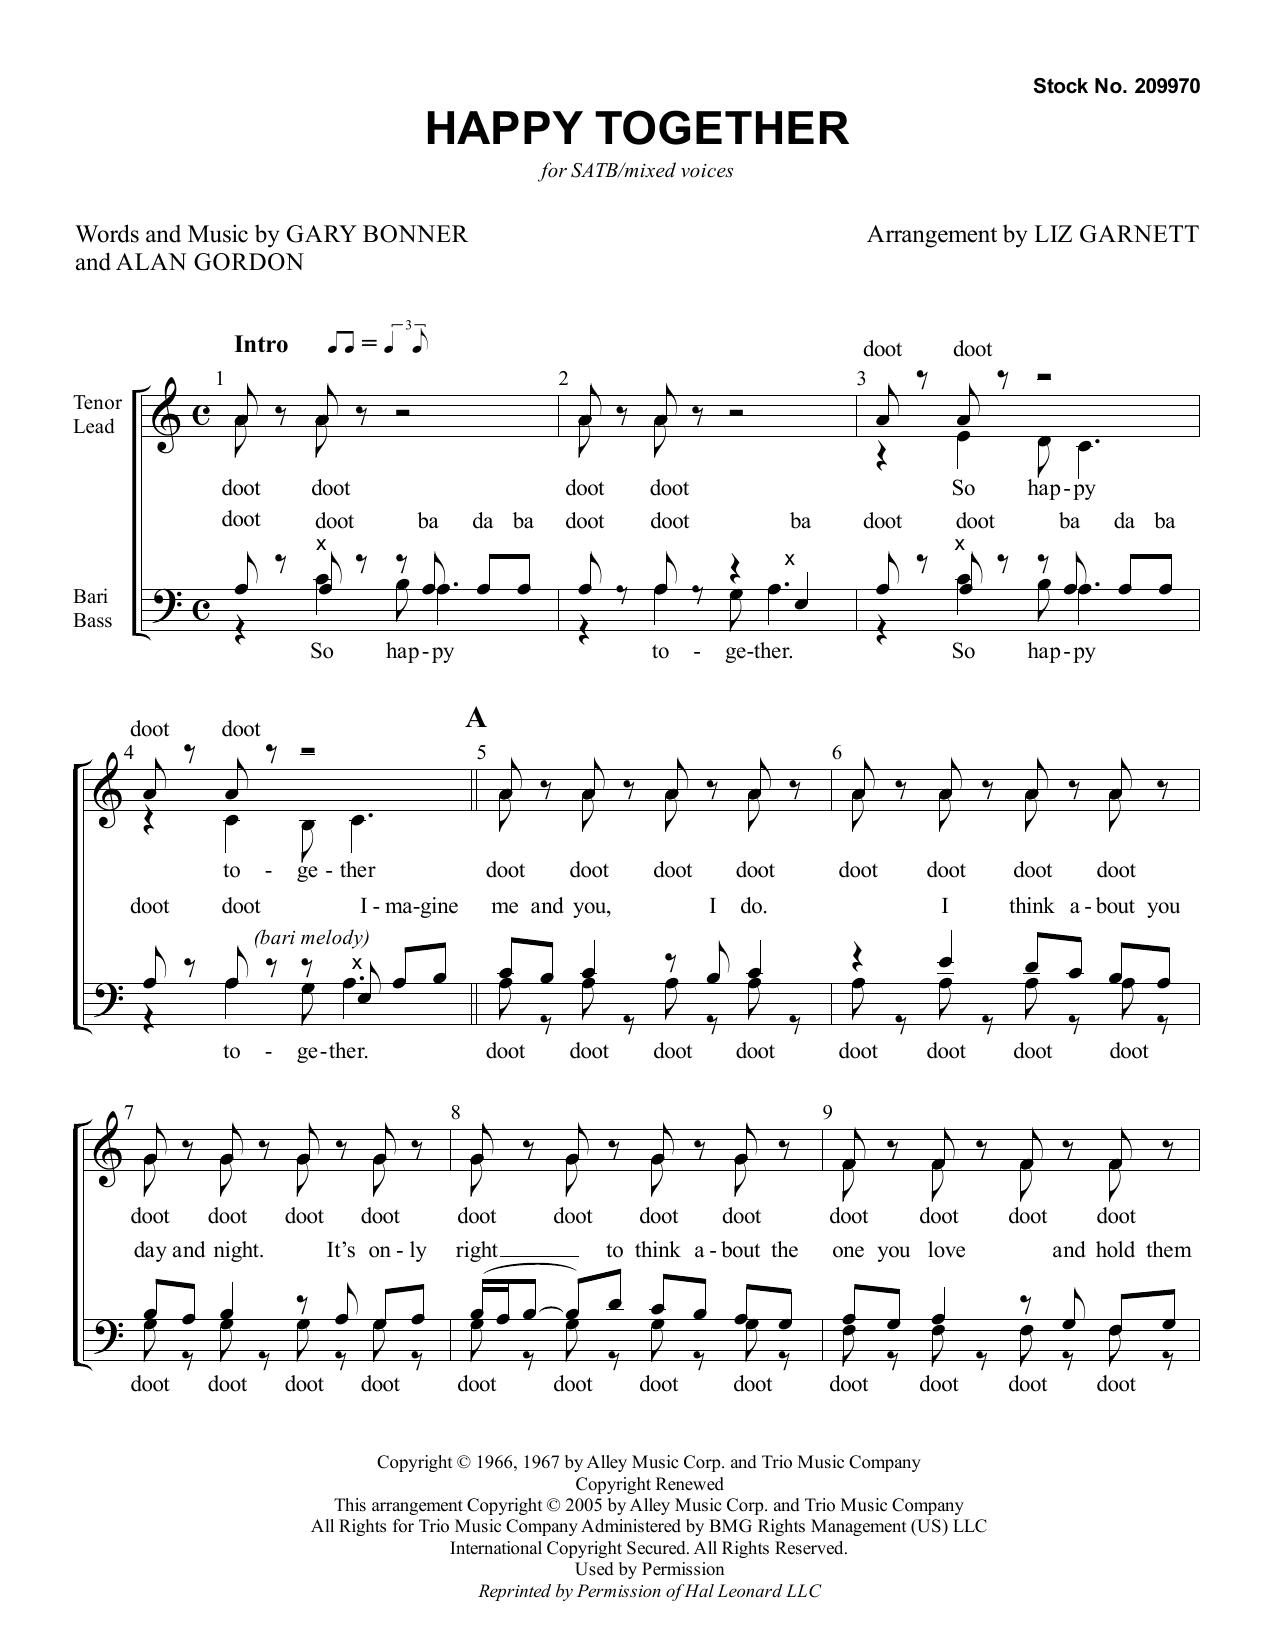 Happy Together (arr. Liz Garnett) Sheet Music